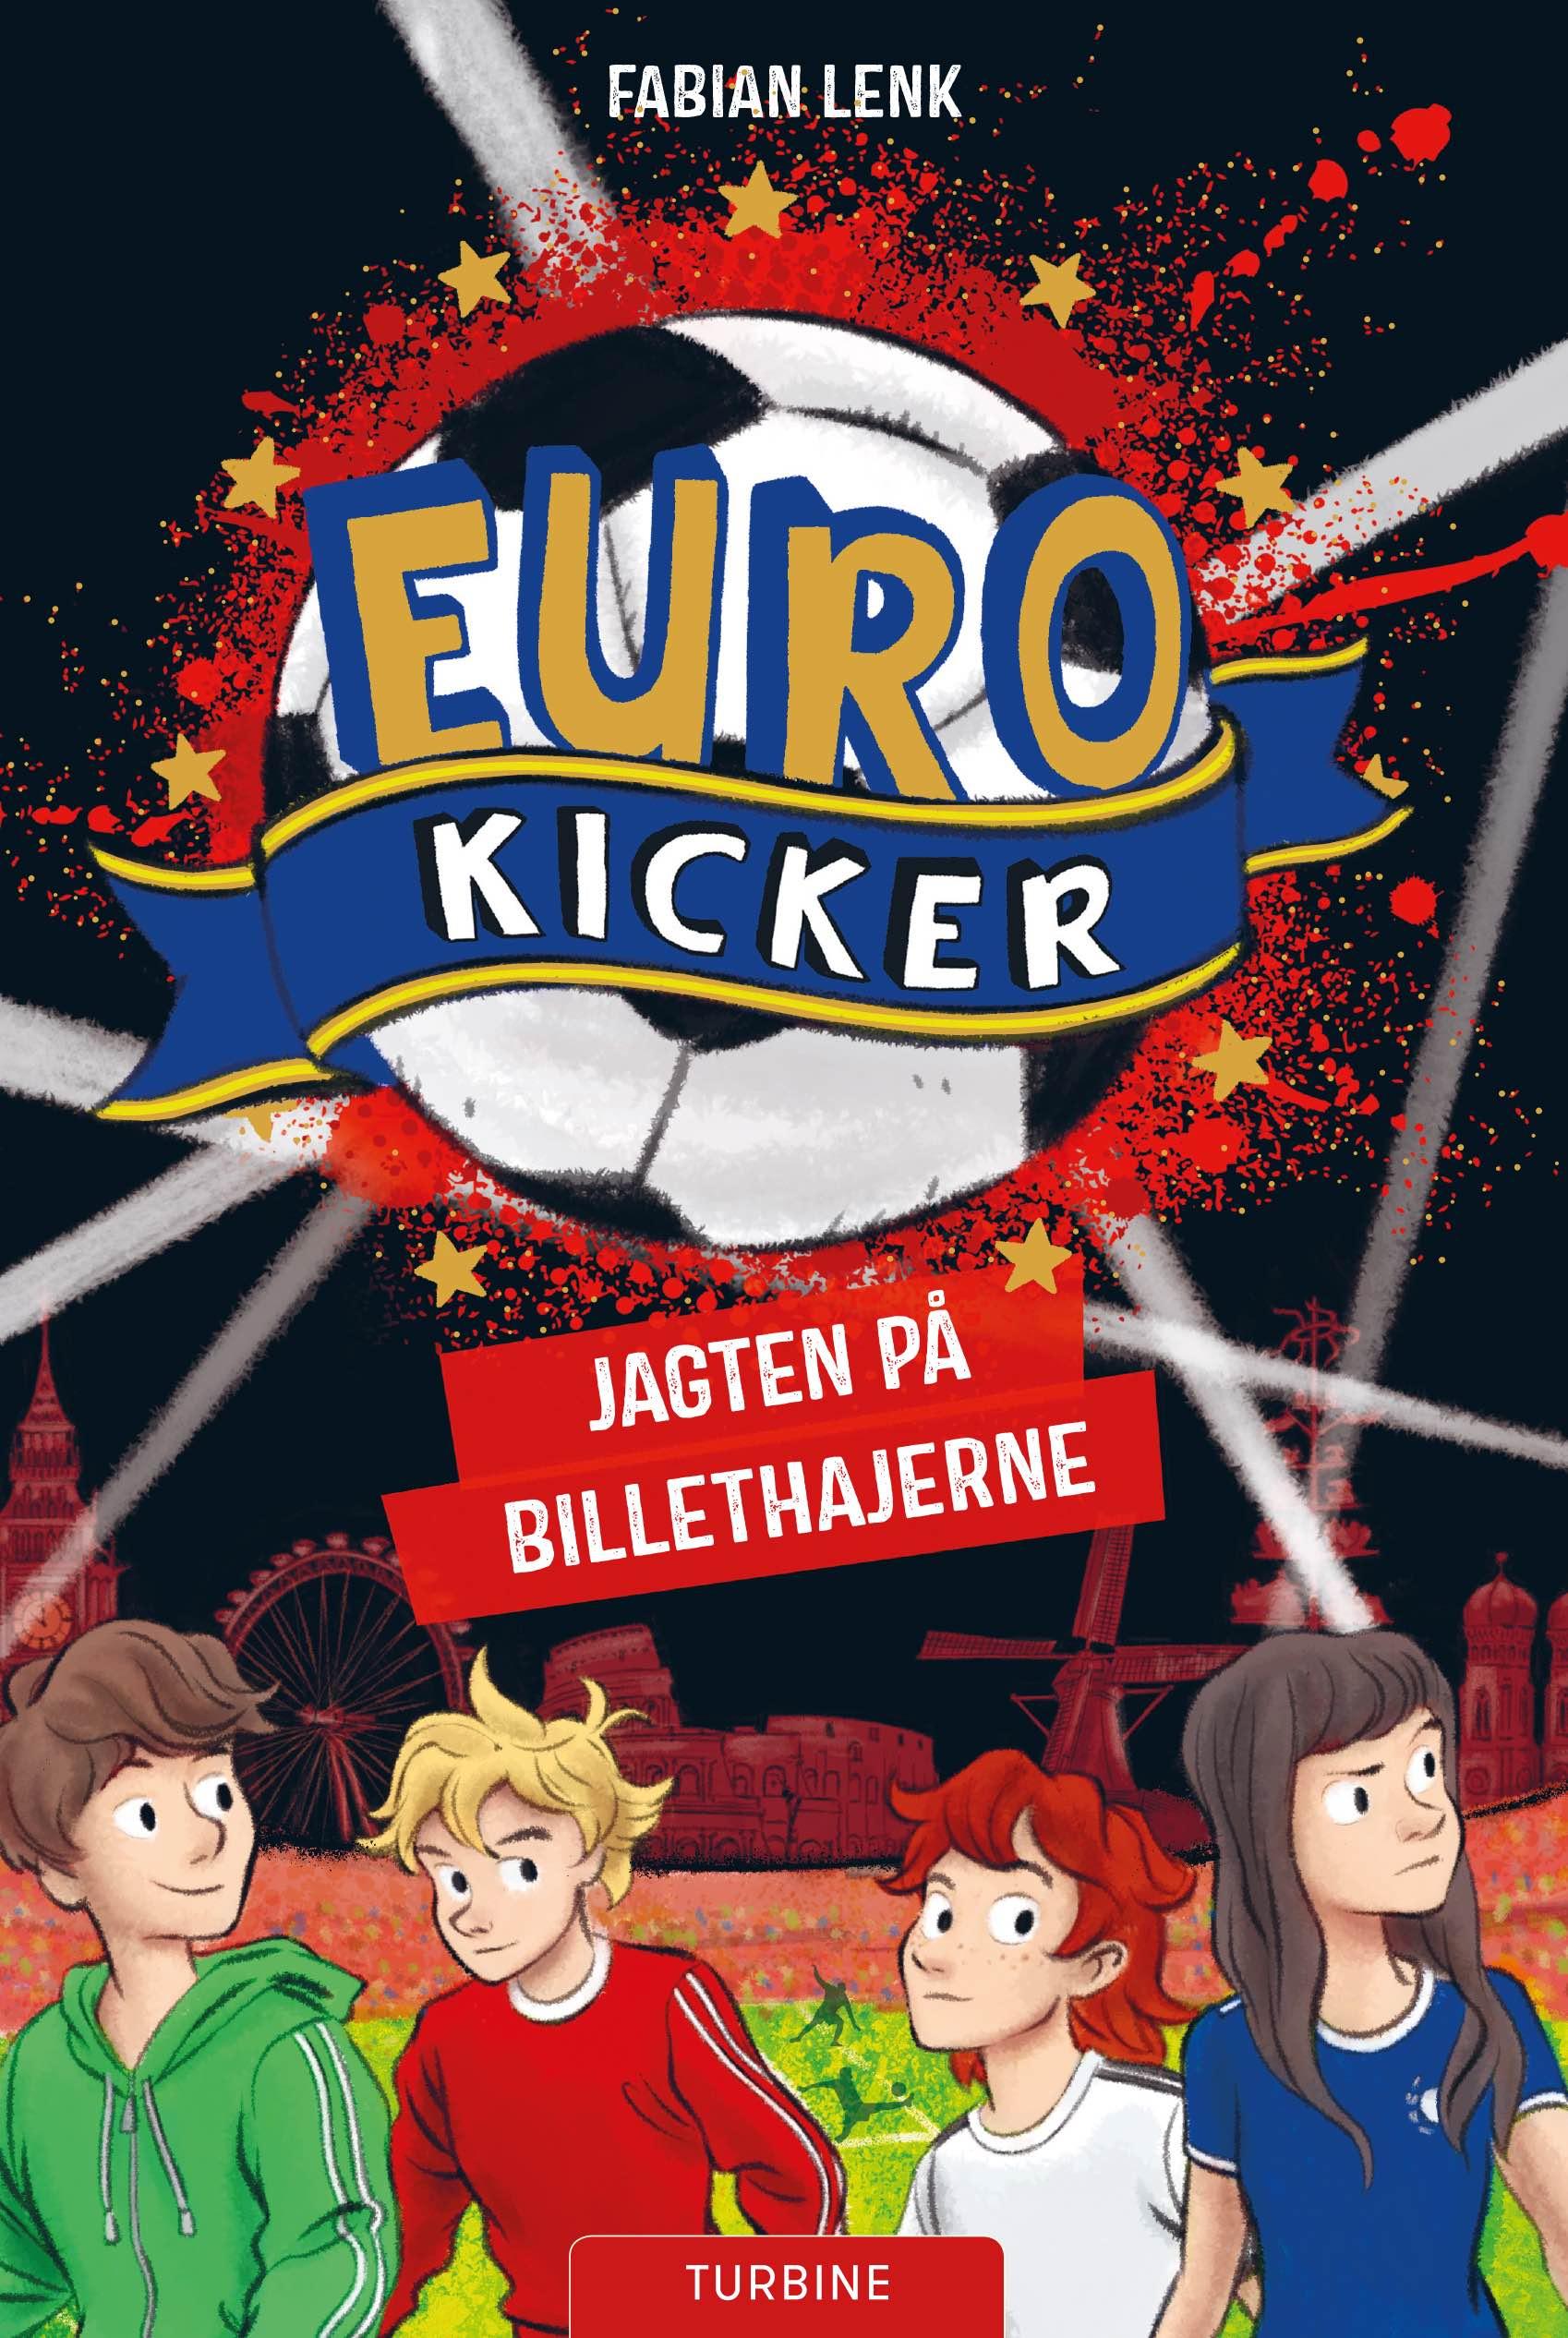 Eurokicker – Jagten på billethajerne